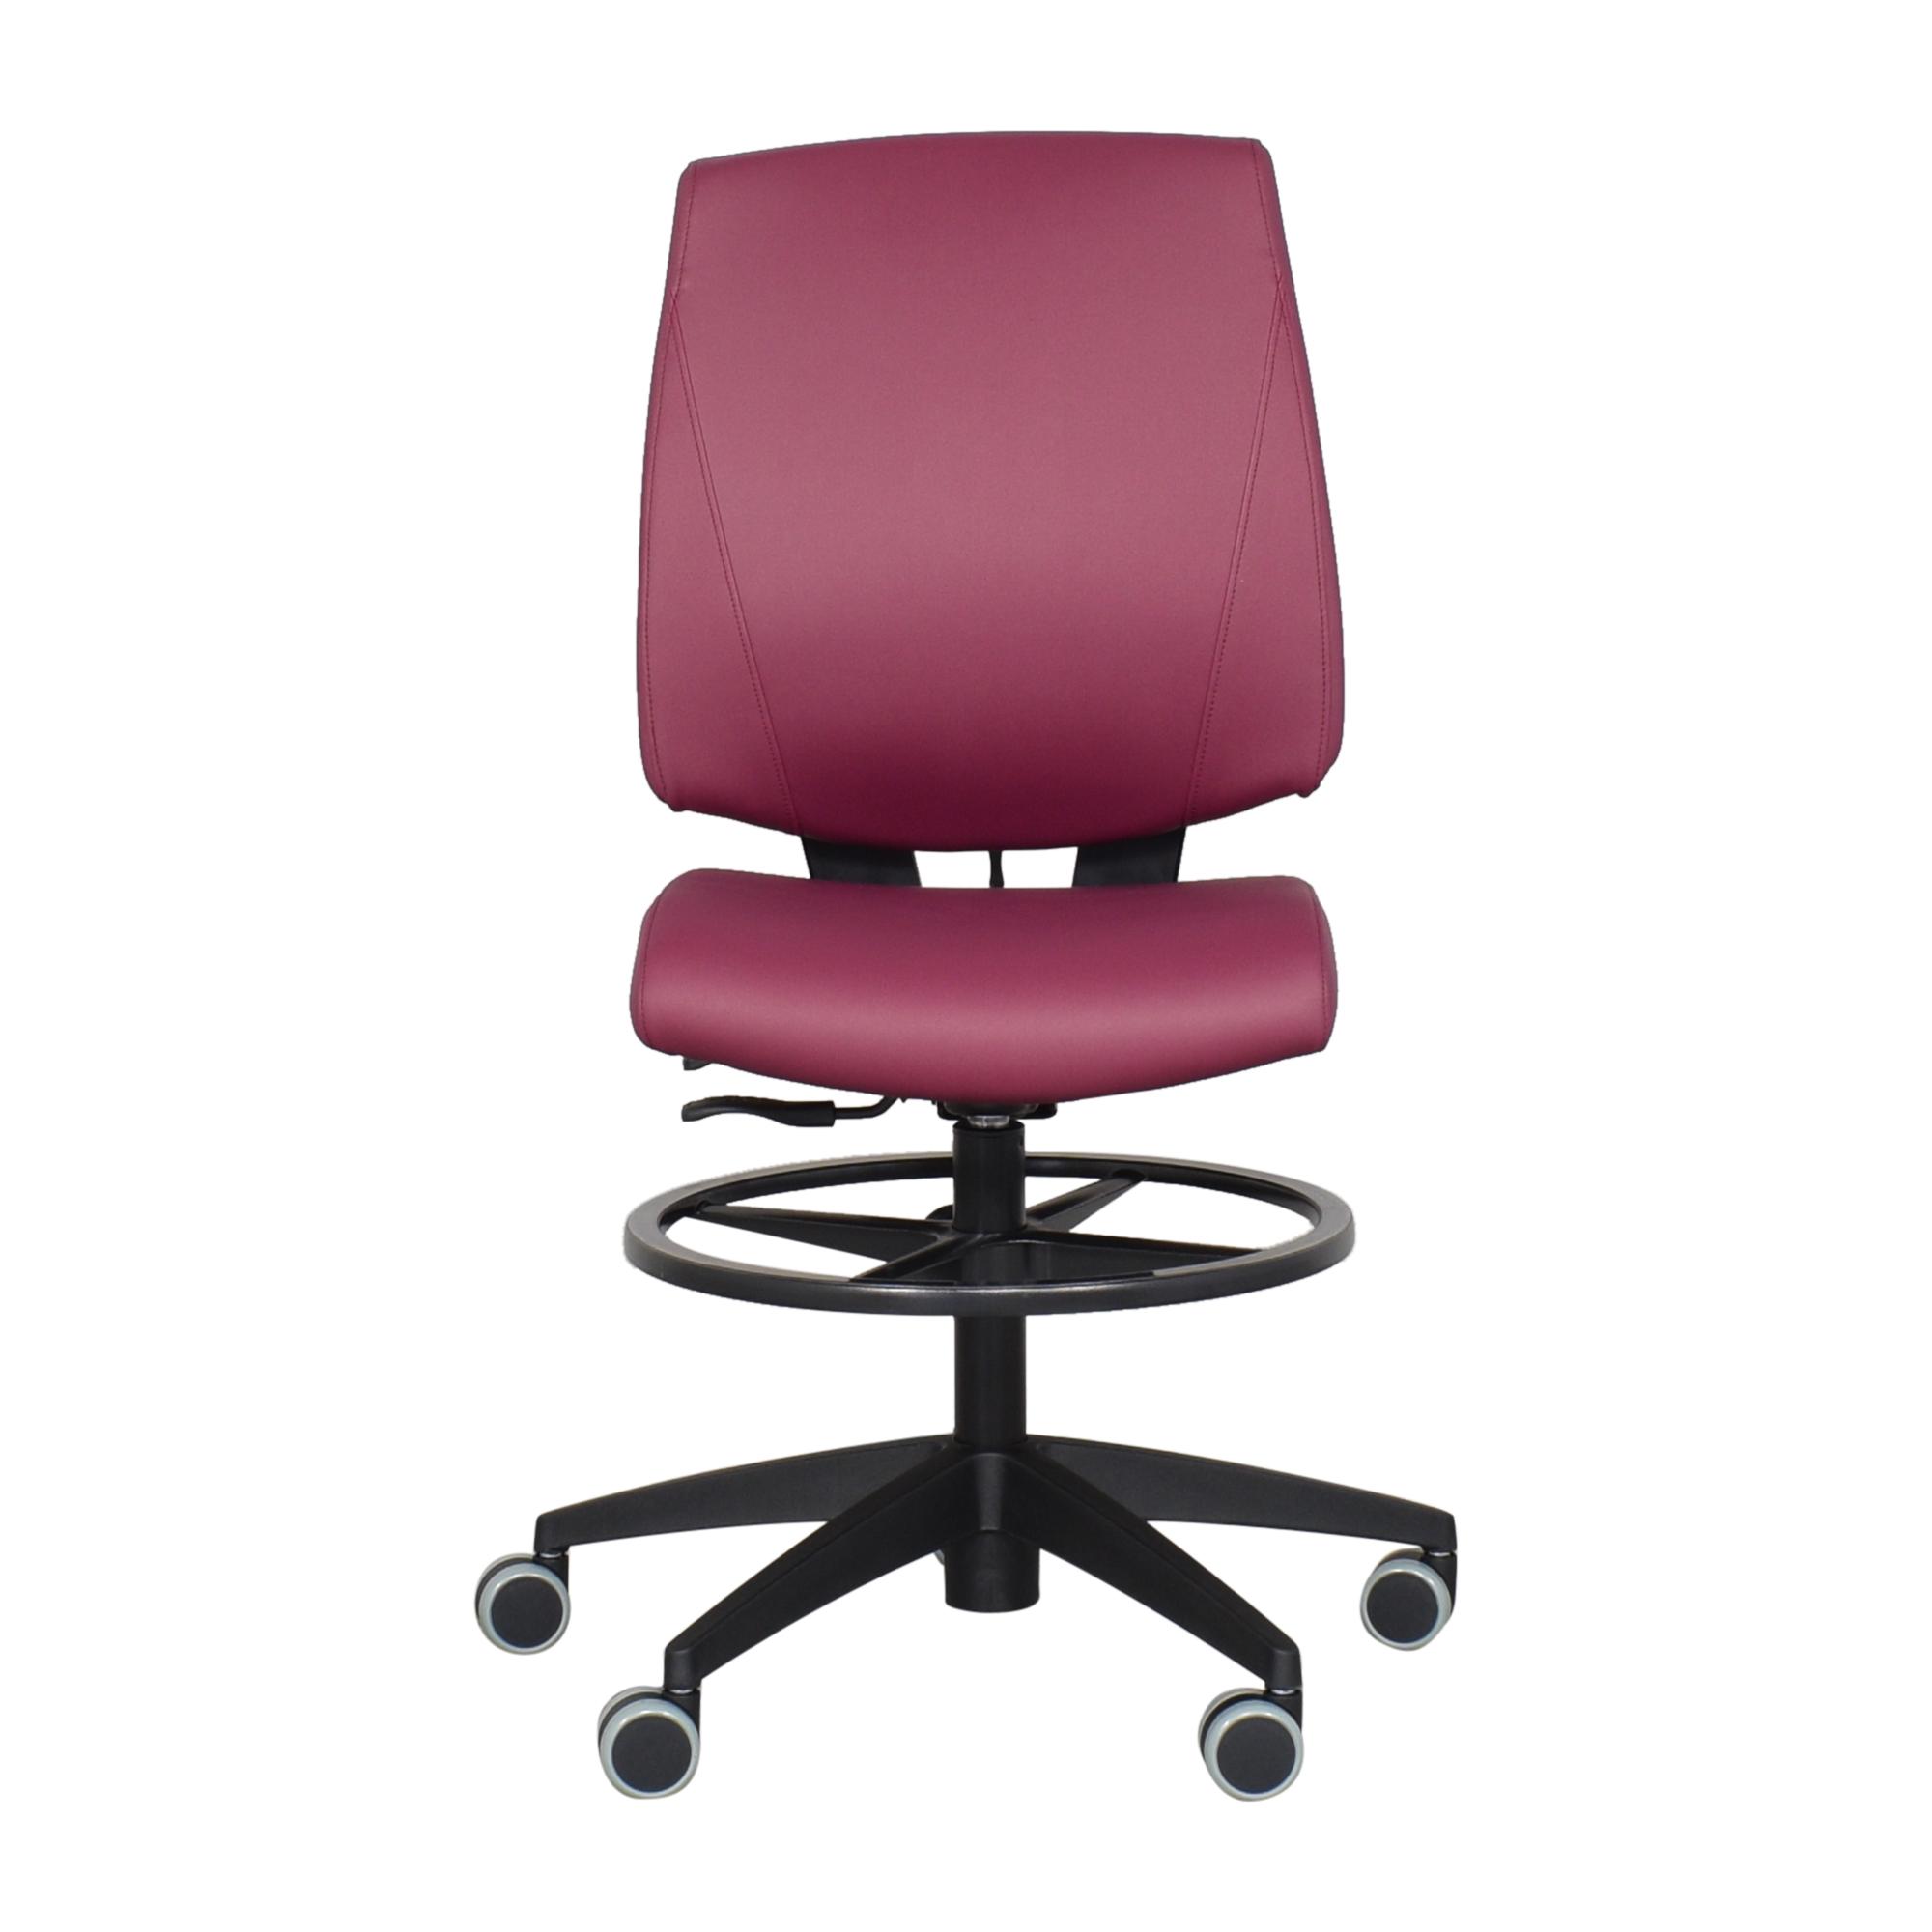 shop Global Furniture Group G1 Ergo Select Drafting Stool Global Furniture Group Chairs